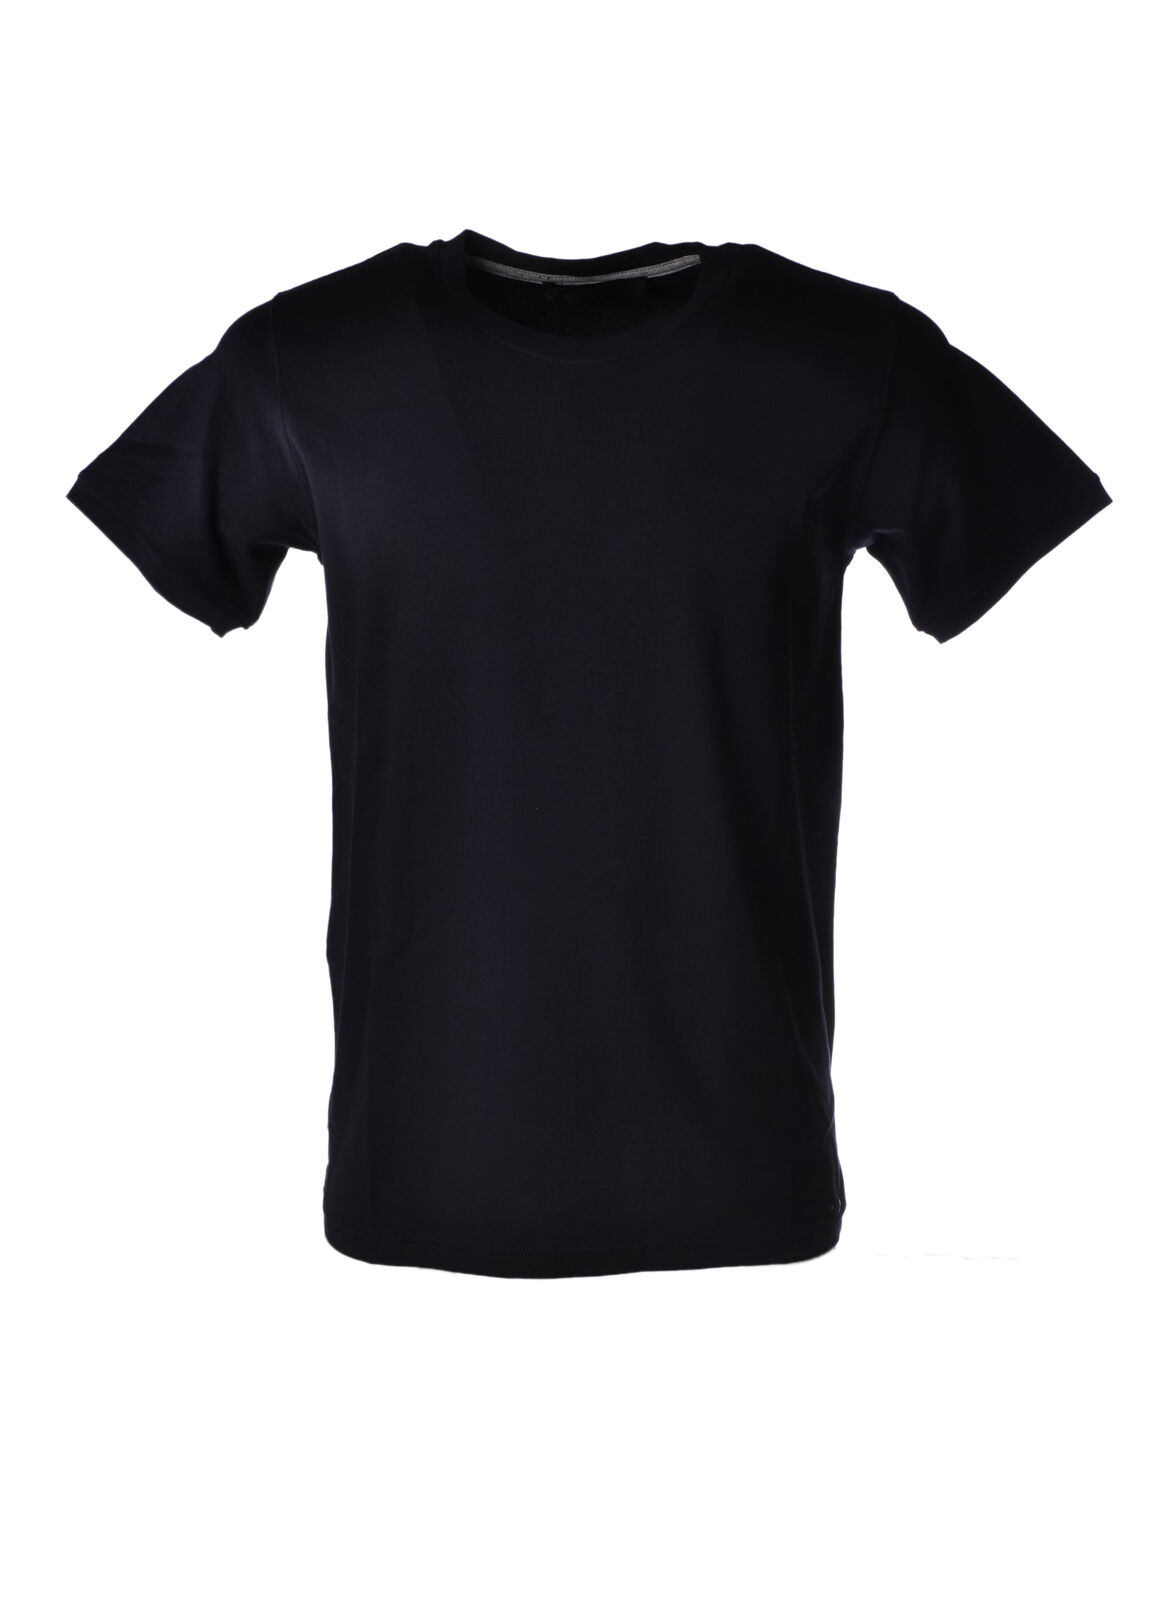 Laboratori Italiani - Topwear-T-shirts - Mann - Blau - 5017431E191232